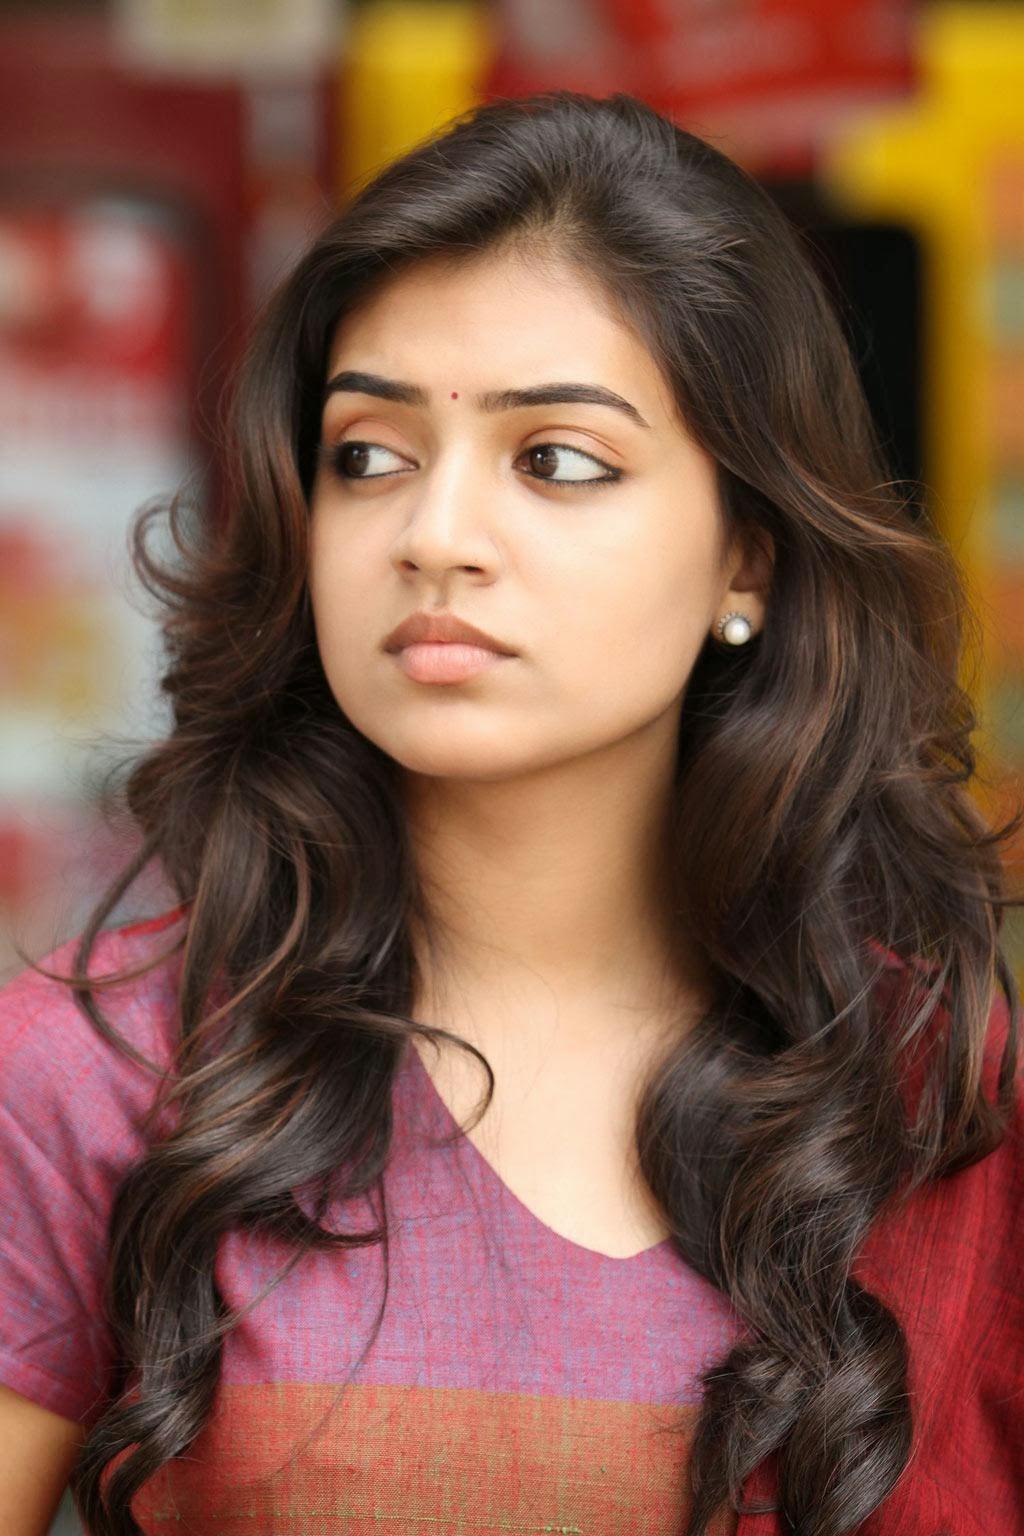 Starost 16 Tamil Dekle Fotografija